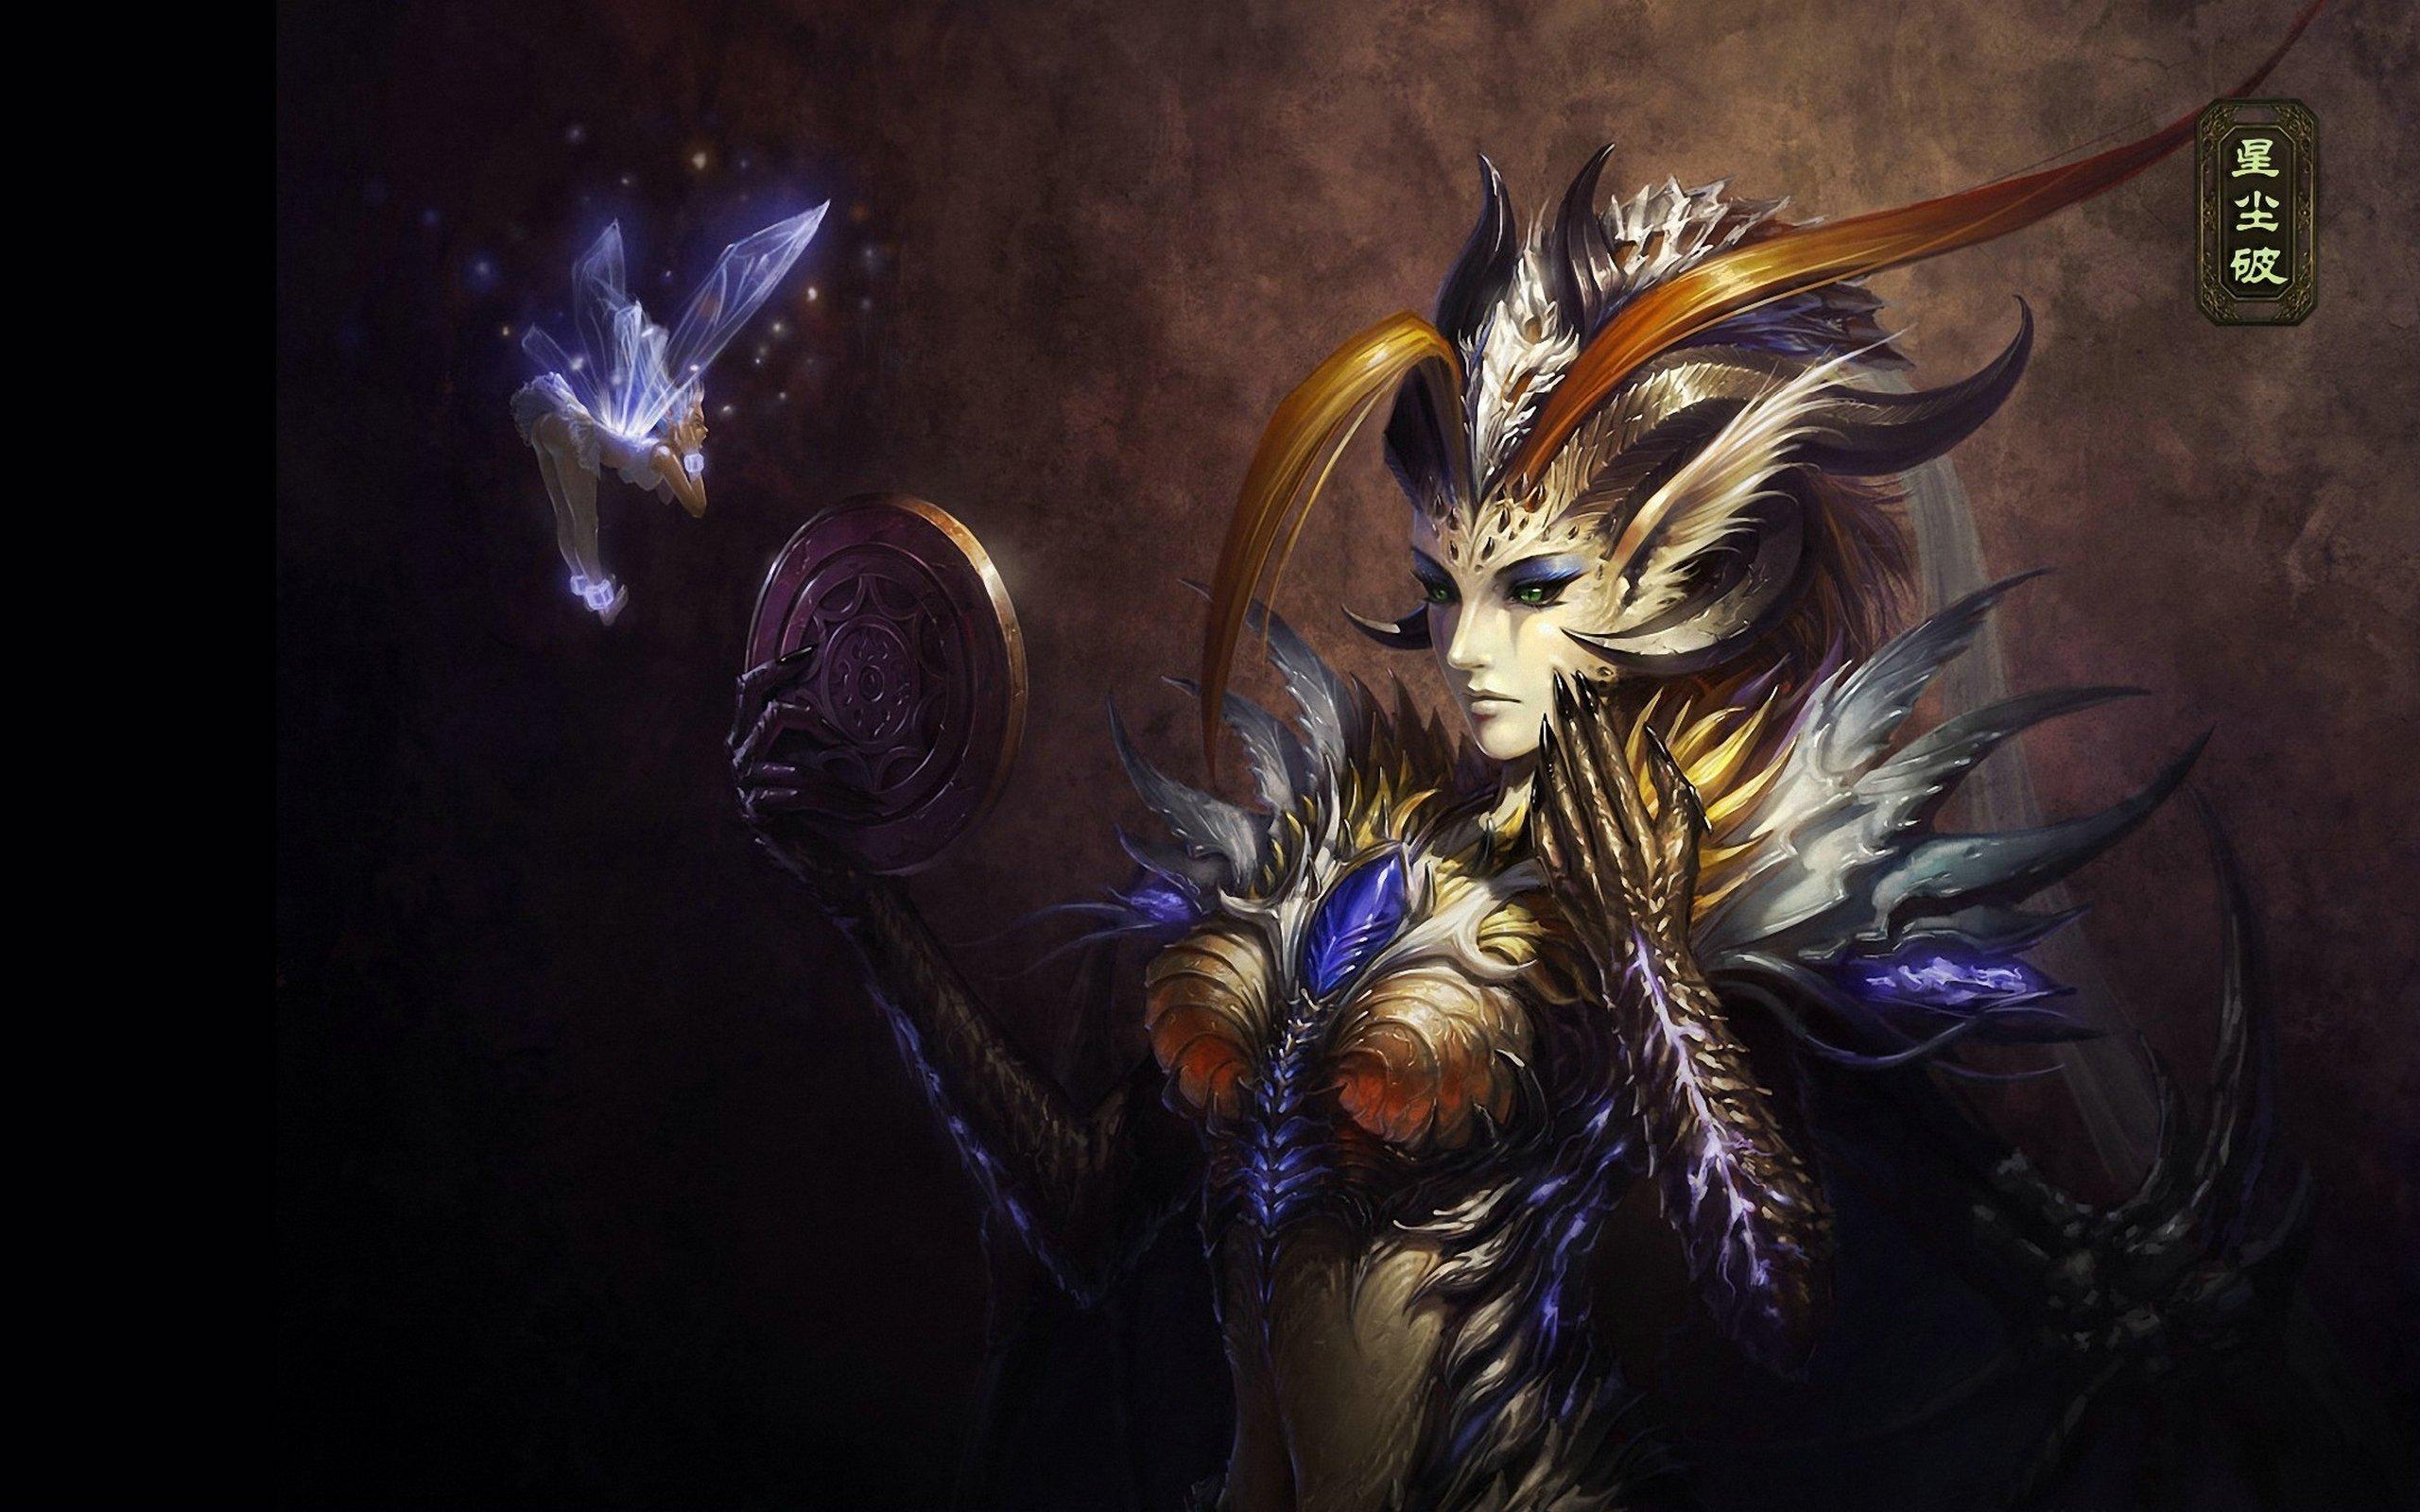 OF ANGELS fantasy angel warrior league angels game loa 6 wallpaper 2560x1600